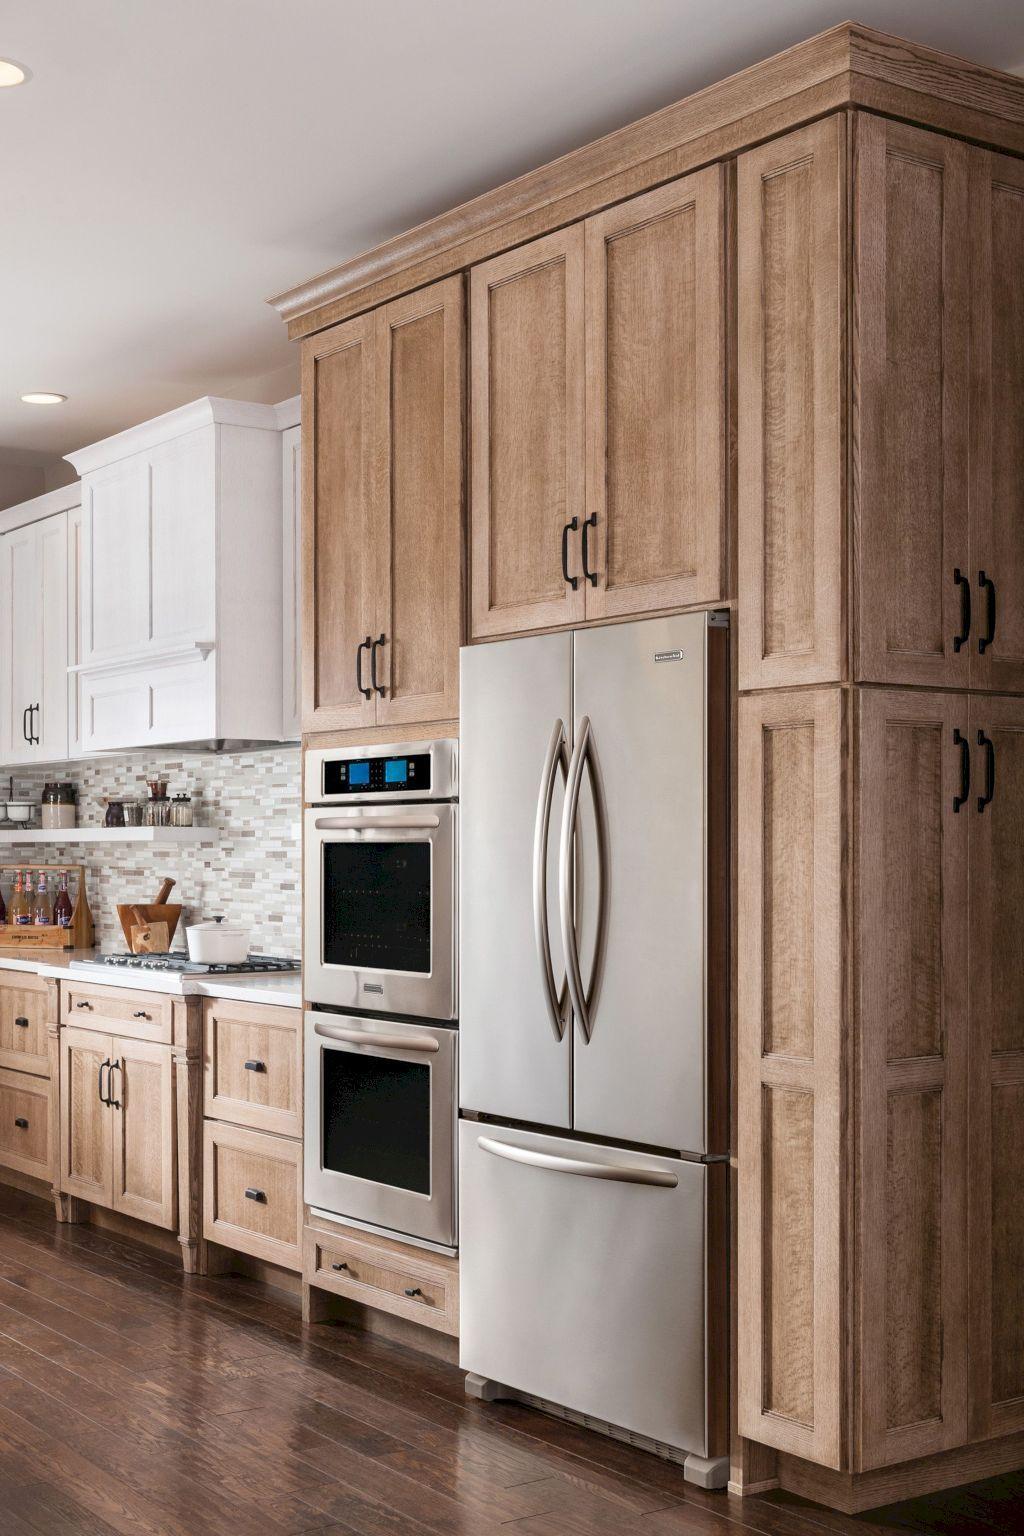 Best Gorgeous Kitchen Cabinets Design And Decor Ideas 85 400 x 300